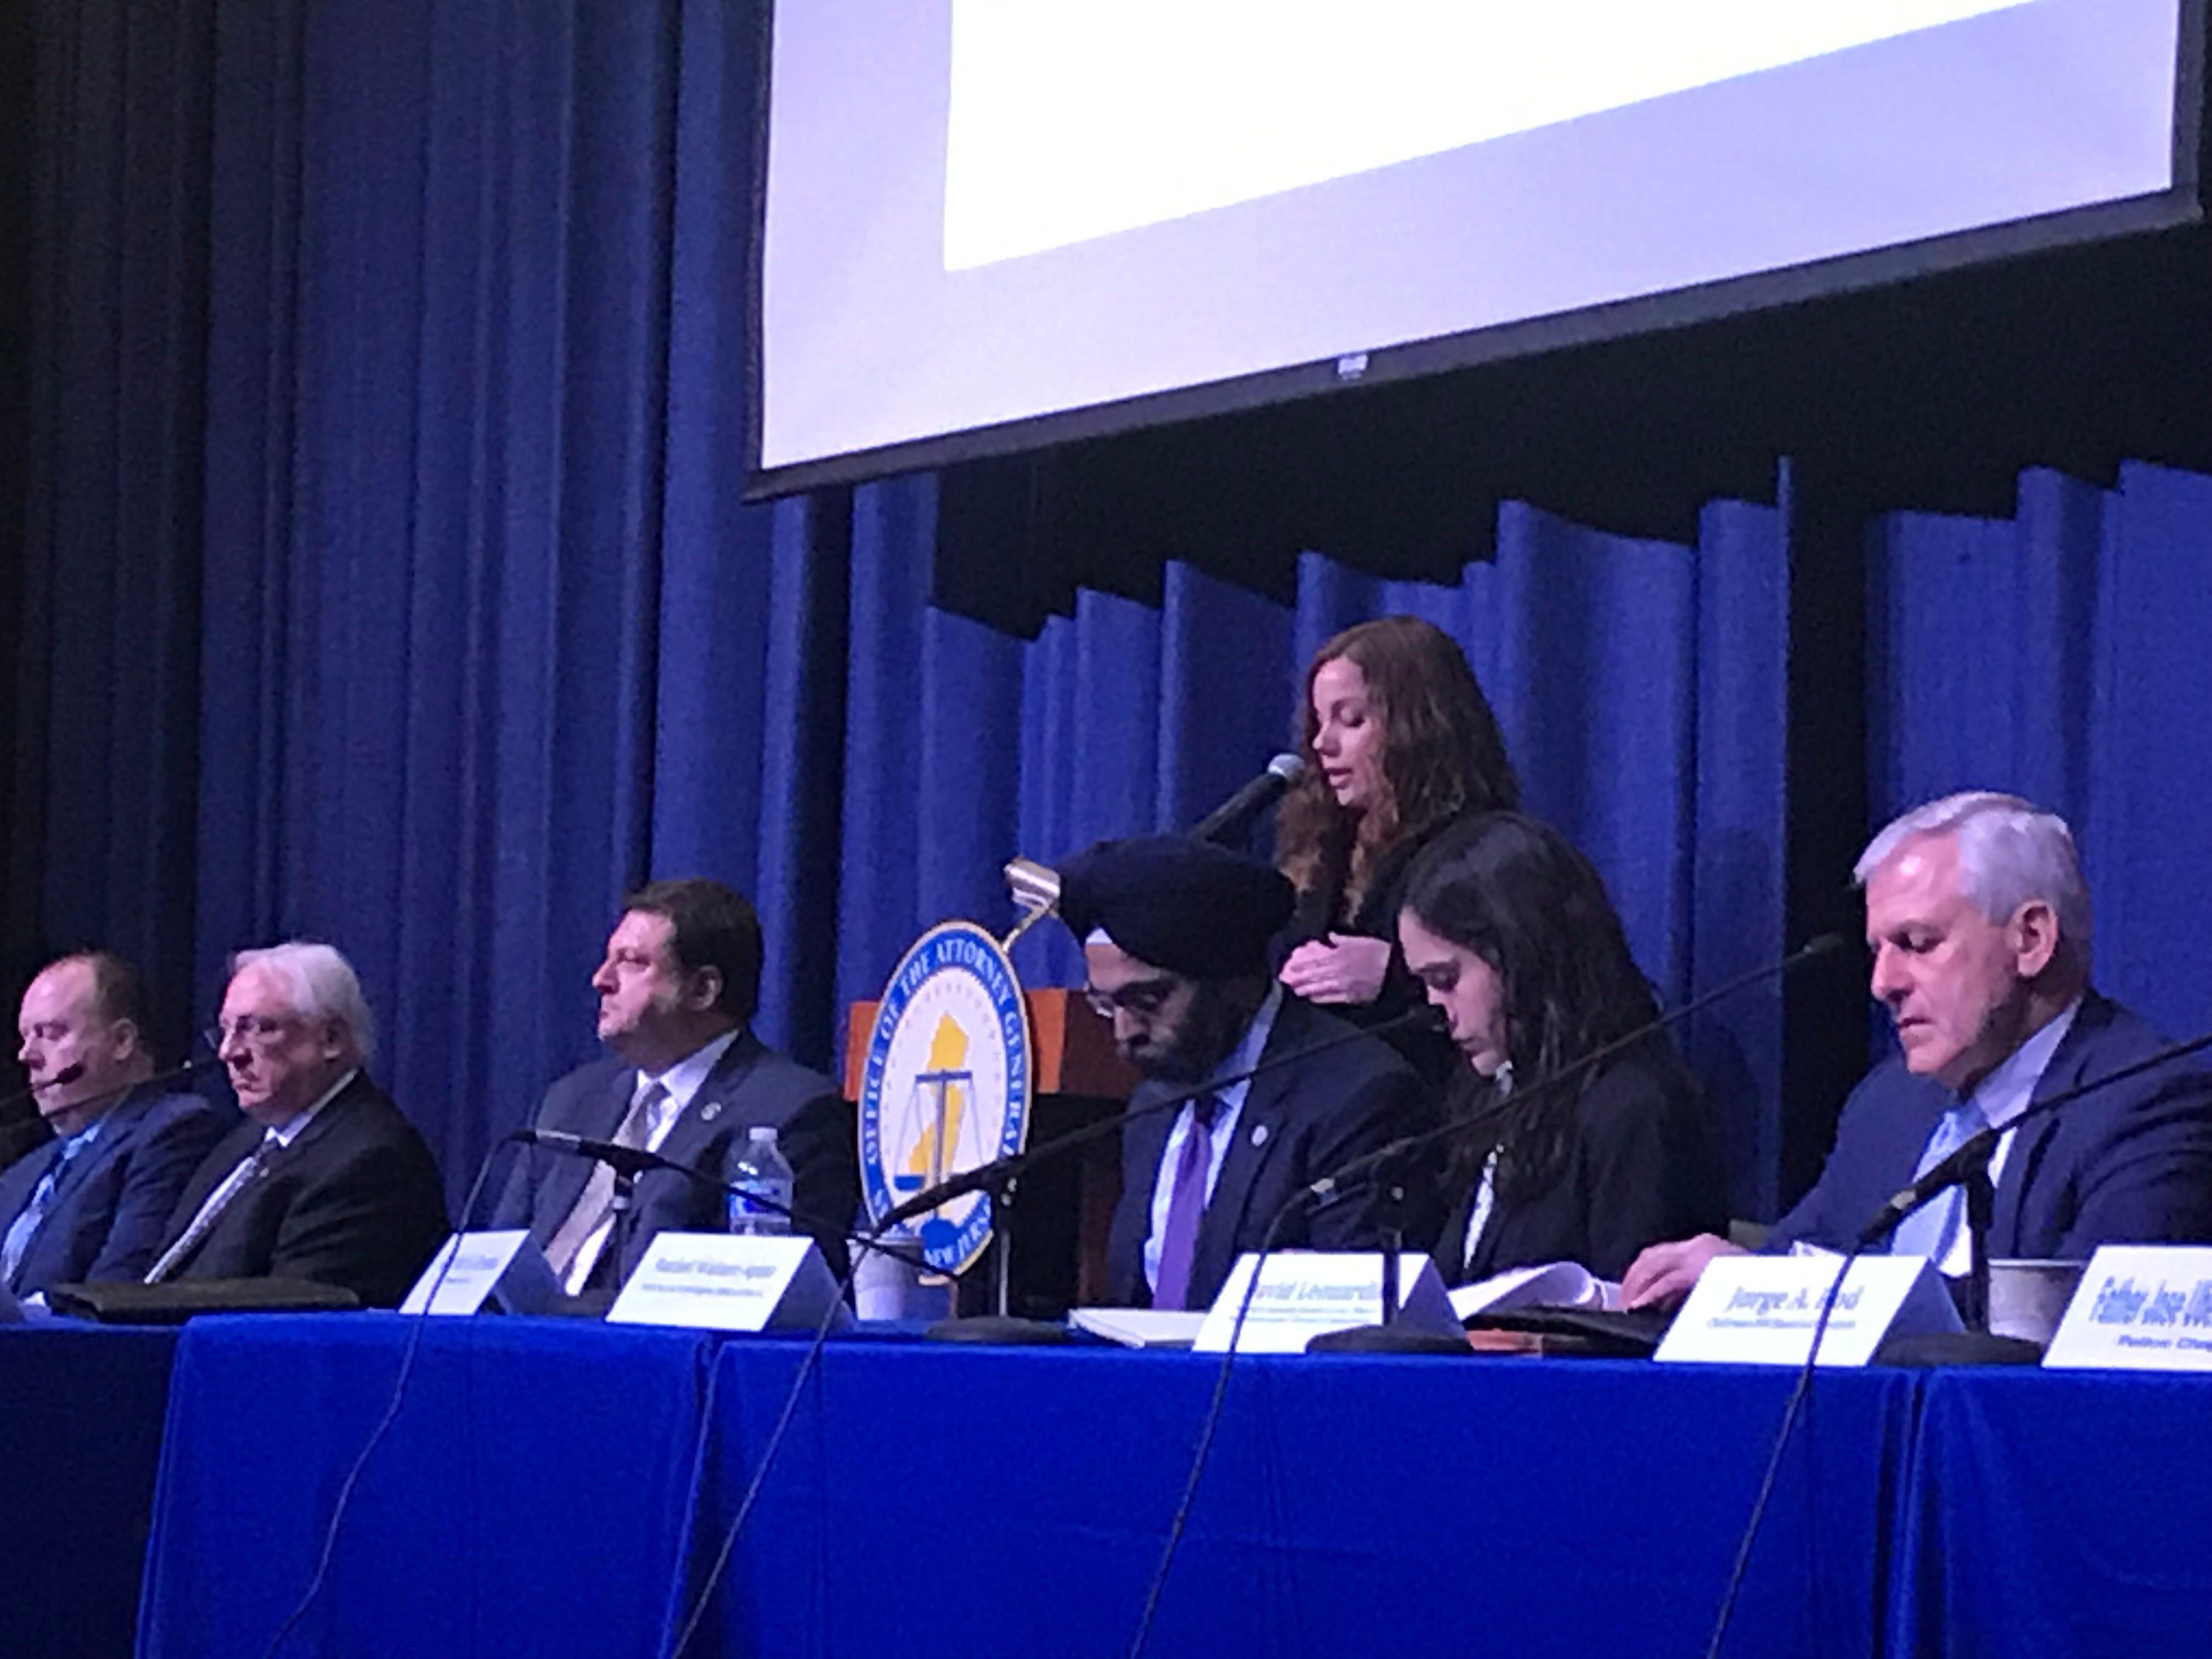 Assistant Prosecutor Alyssa K. Mandara speaks at a town hall meeting March 5.